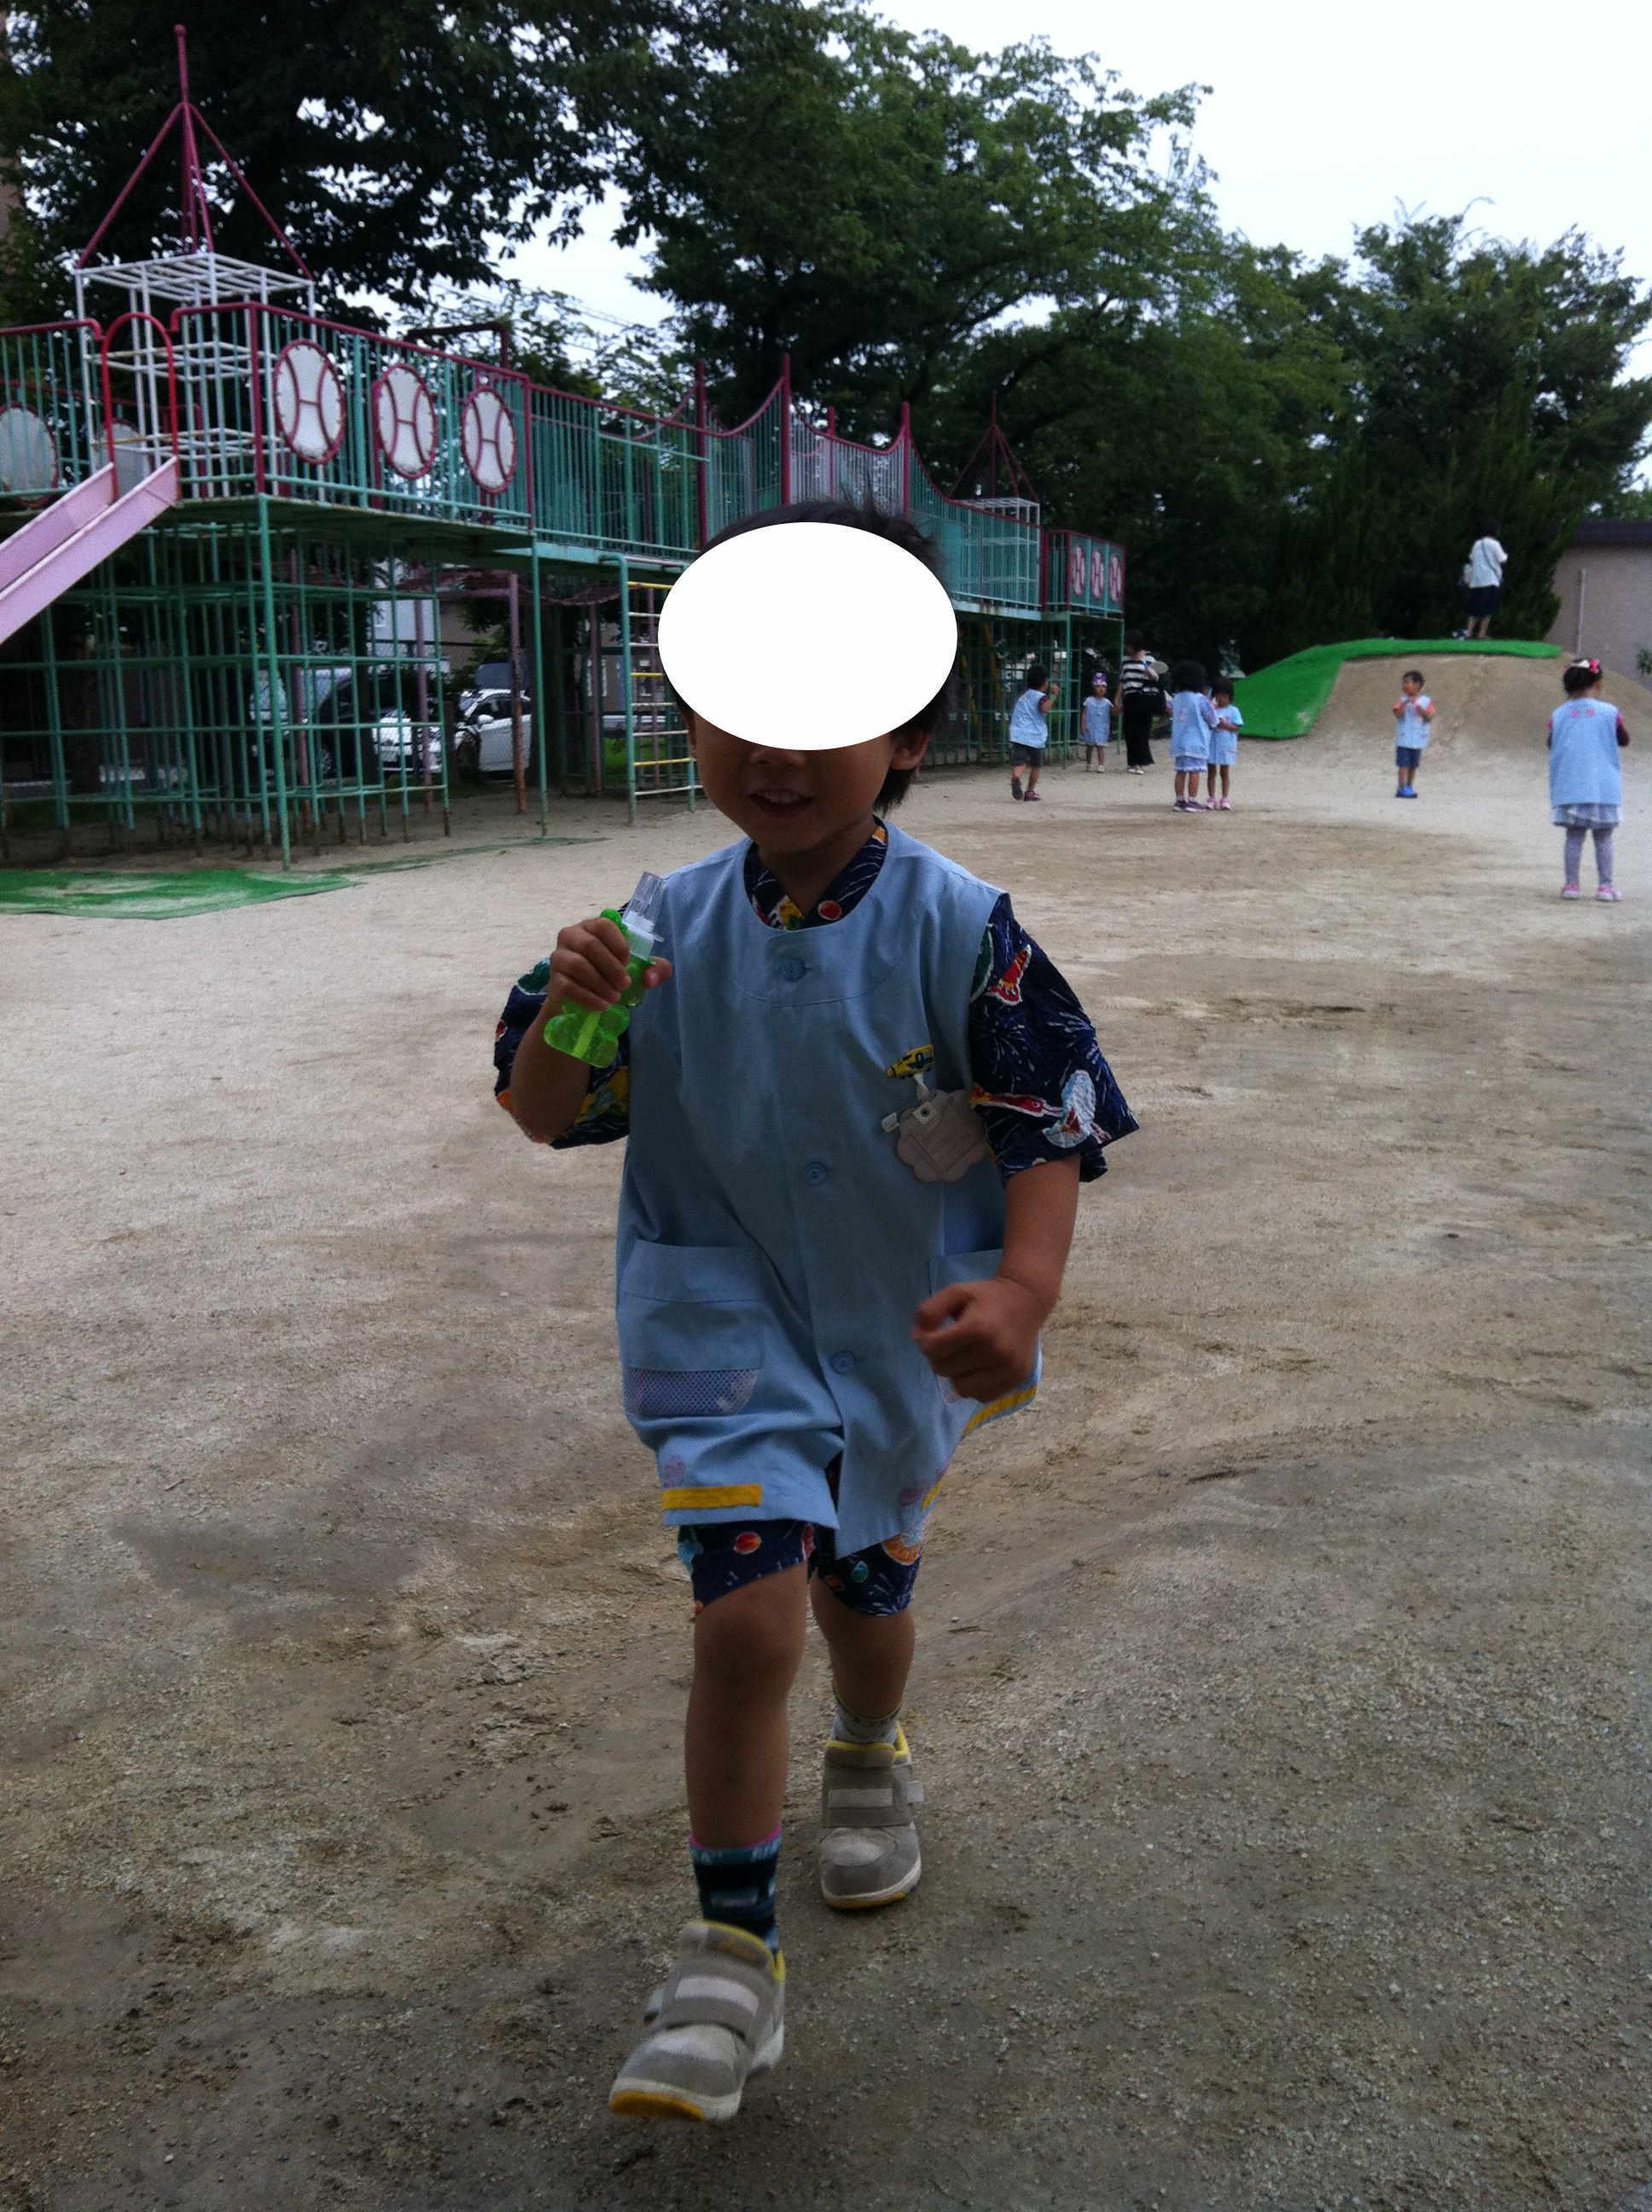 kinder3.jpg